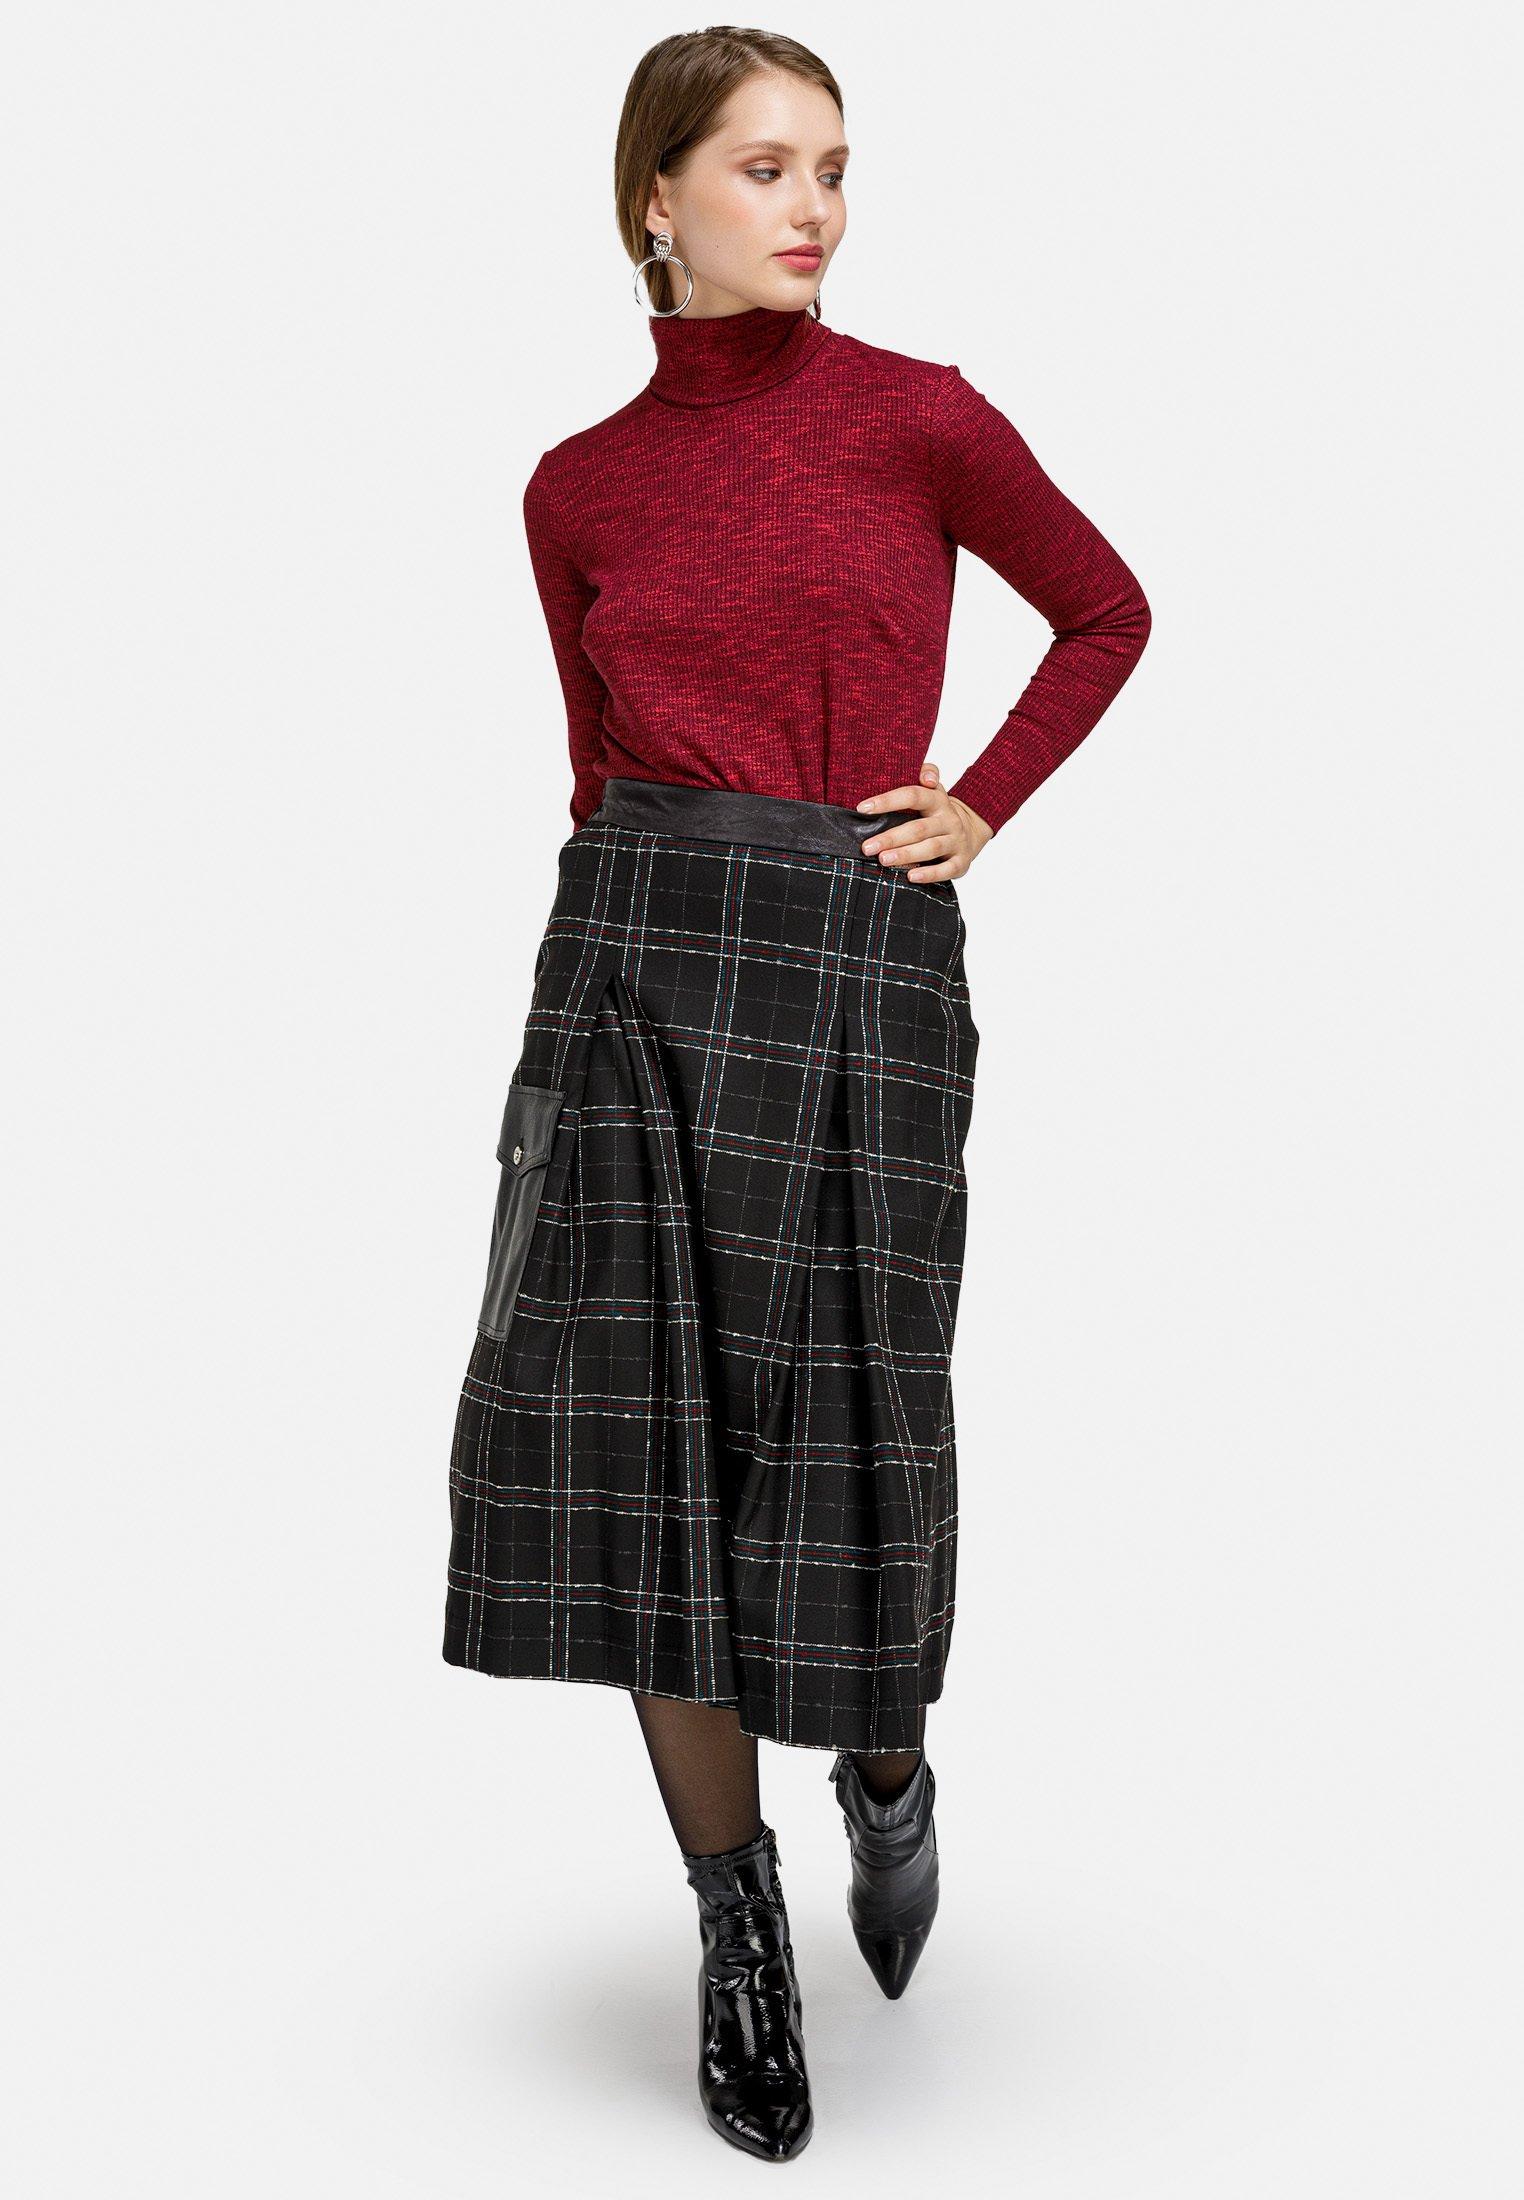 Femme KAROROCK - Jupe plissée